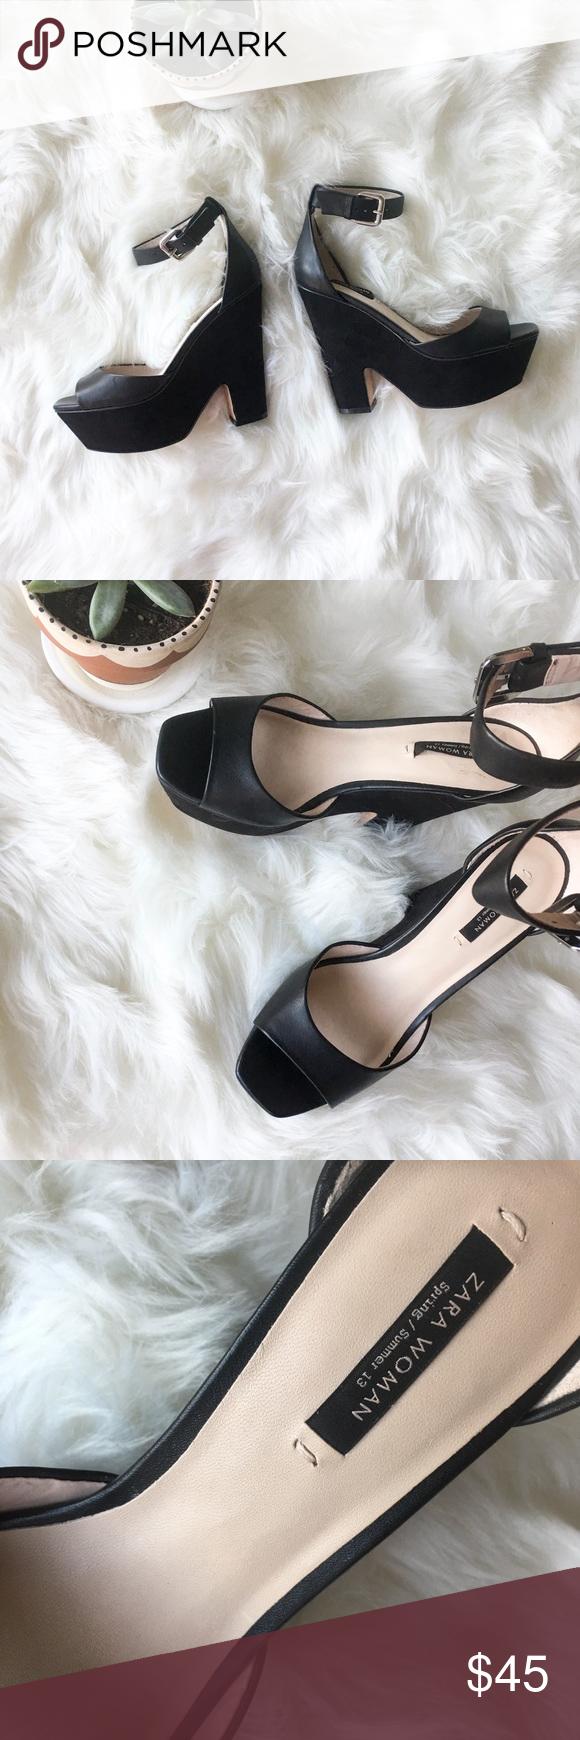 Like Zara Platform Heel Woman 2013 Black NewFaux Springsummer zVqSpGUM